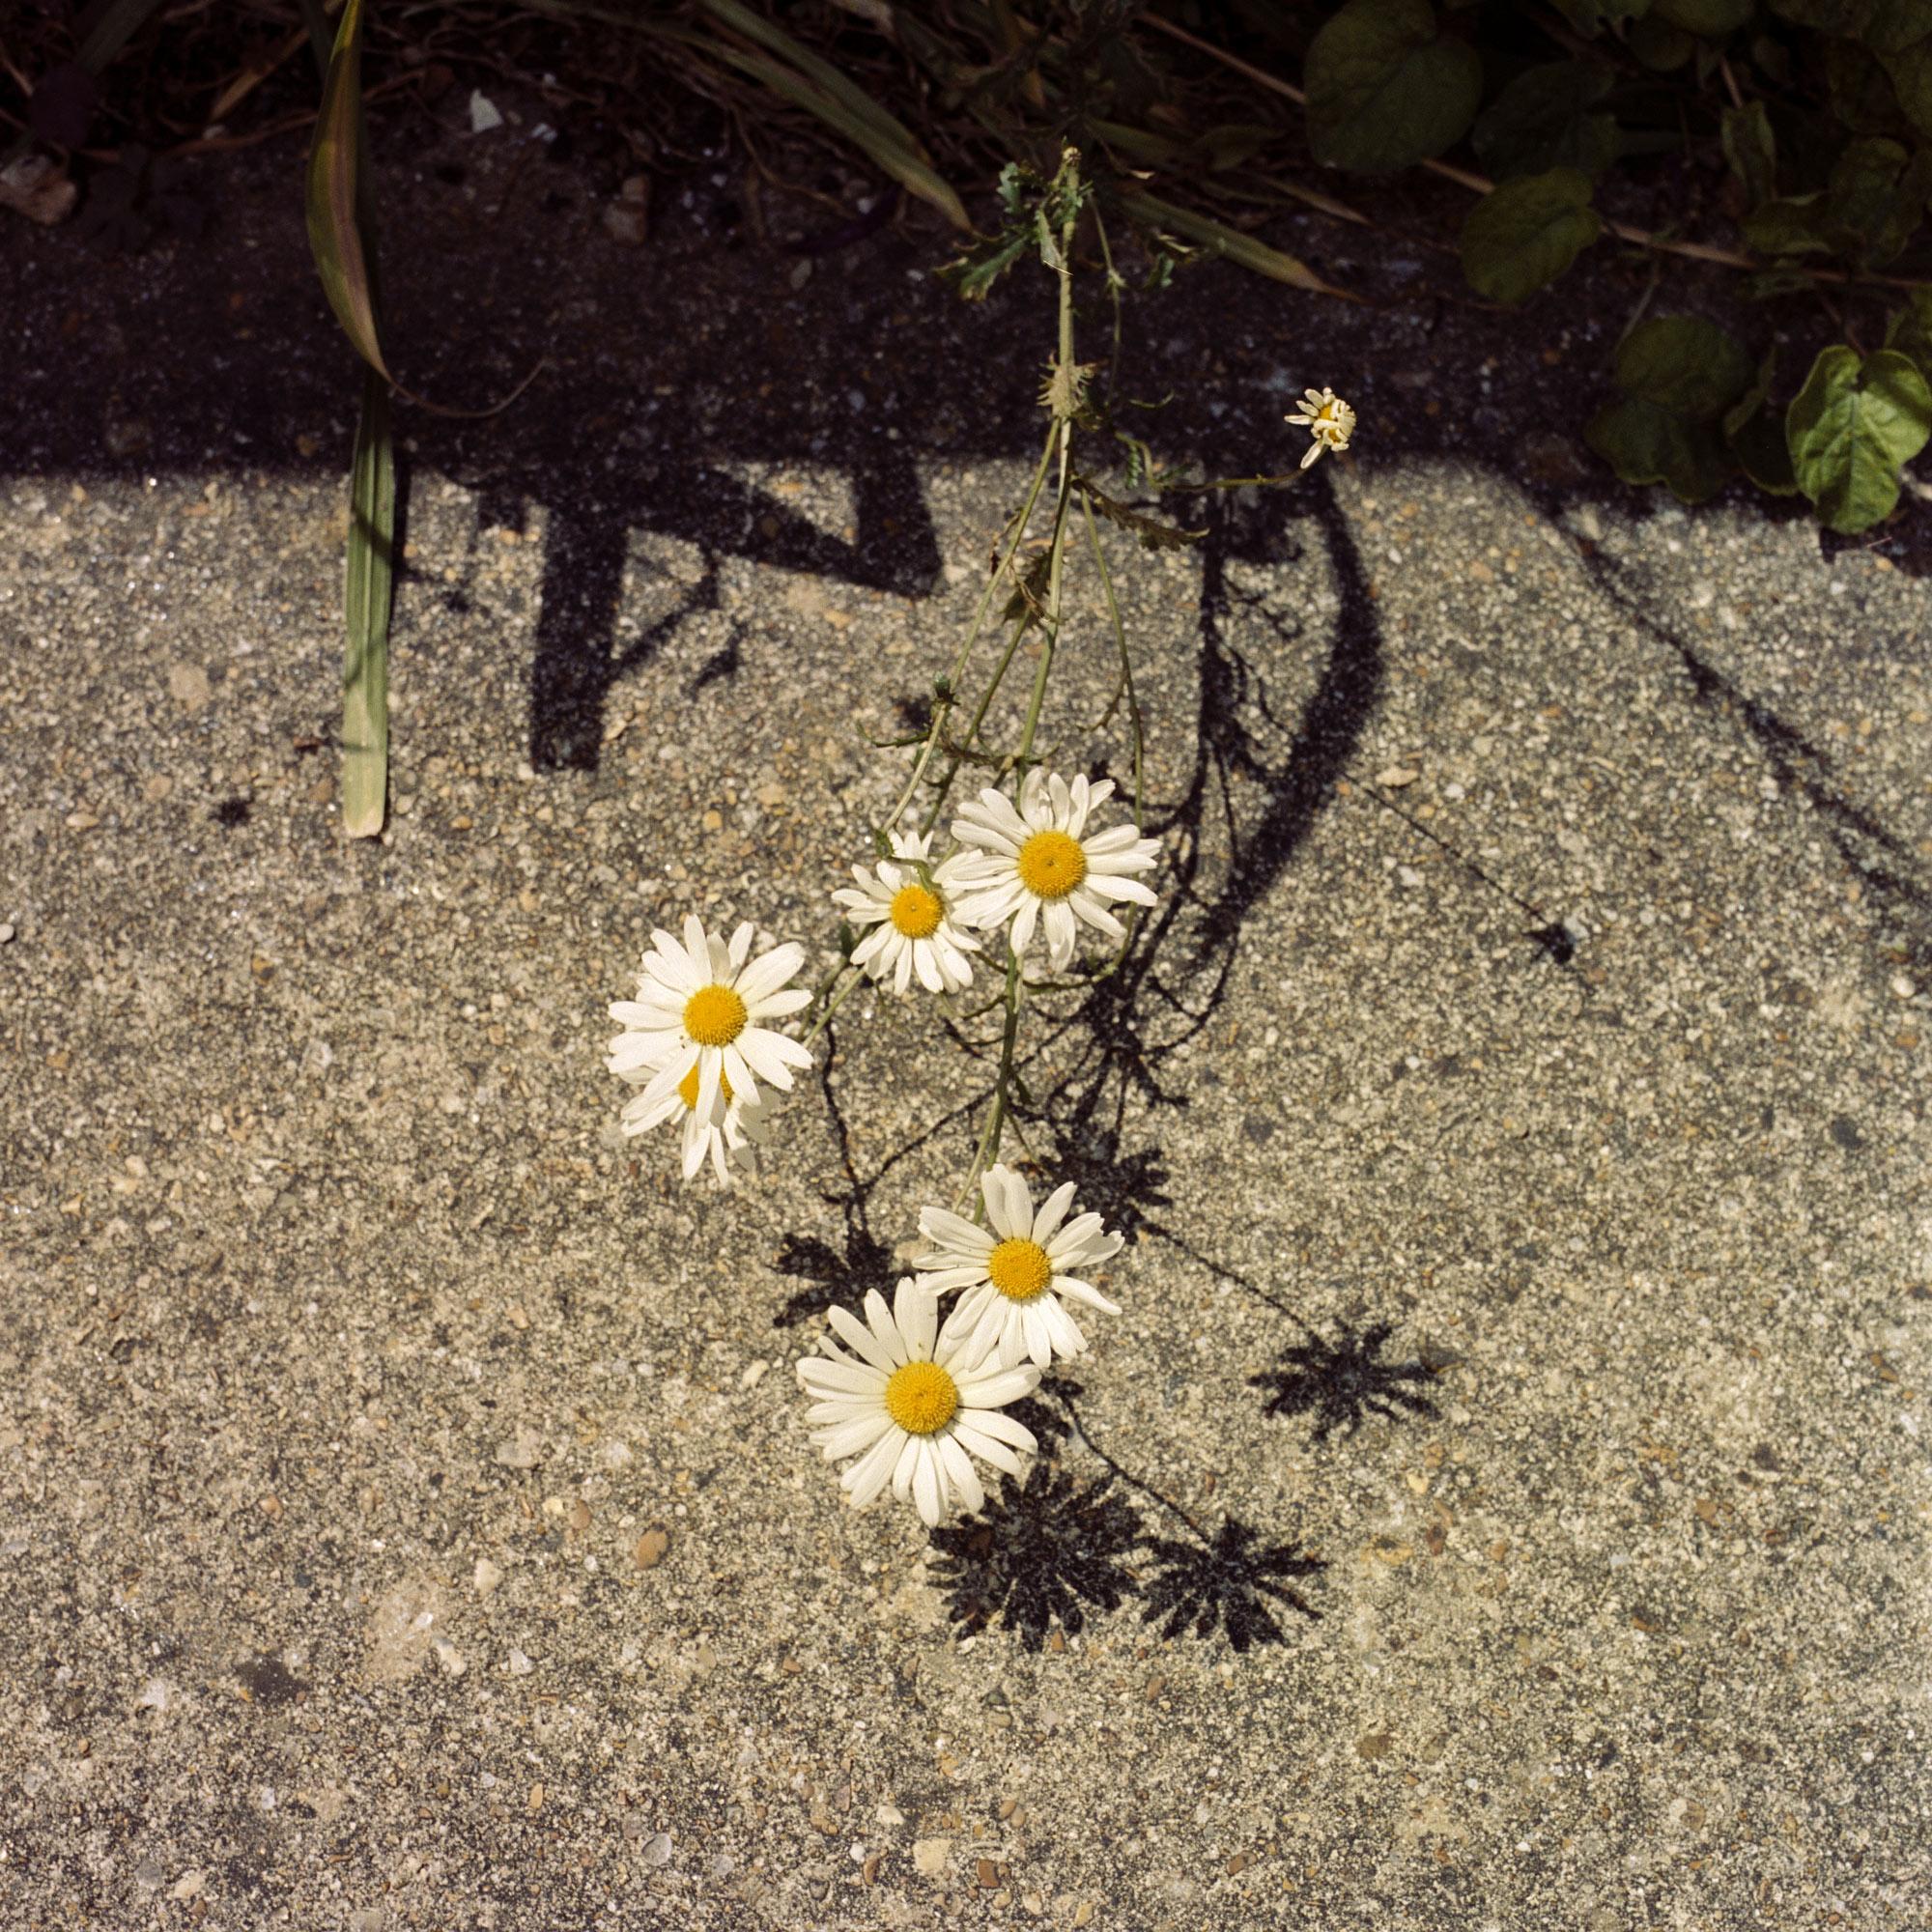 Daisies, observation on film by Ioannis Koussertari.